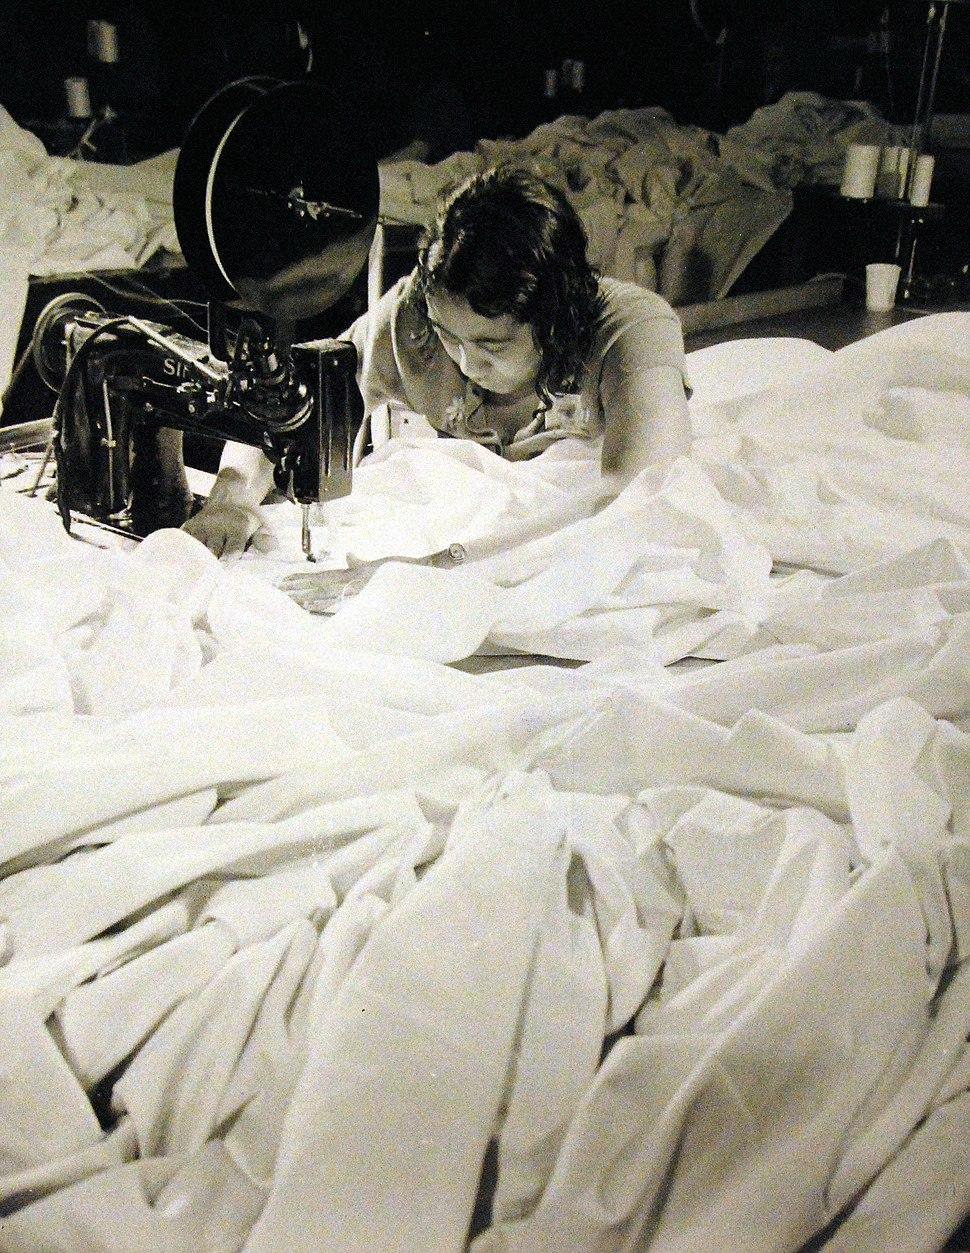 Woman making parachute, Naval Aircraft Factory, Philadelphia, Pennsylvania, 1942 (26923789771)